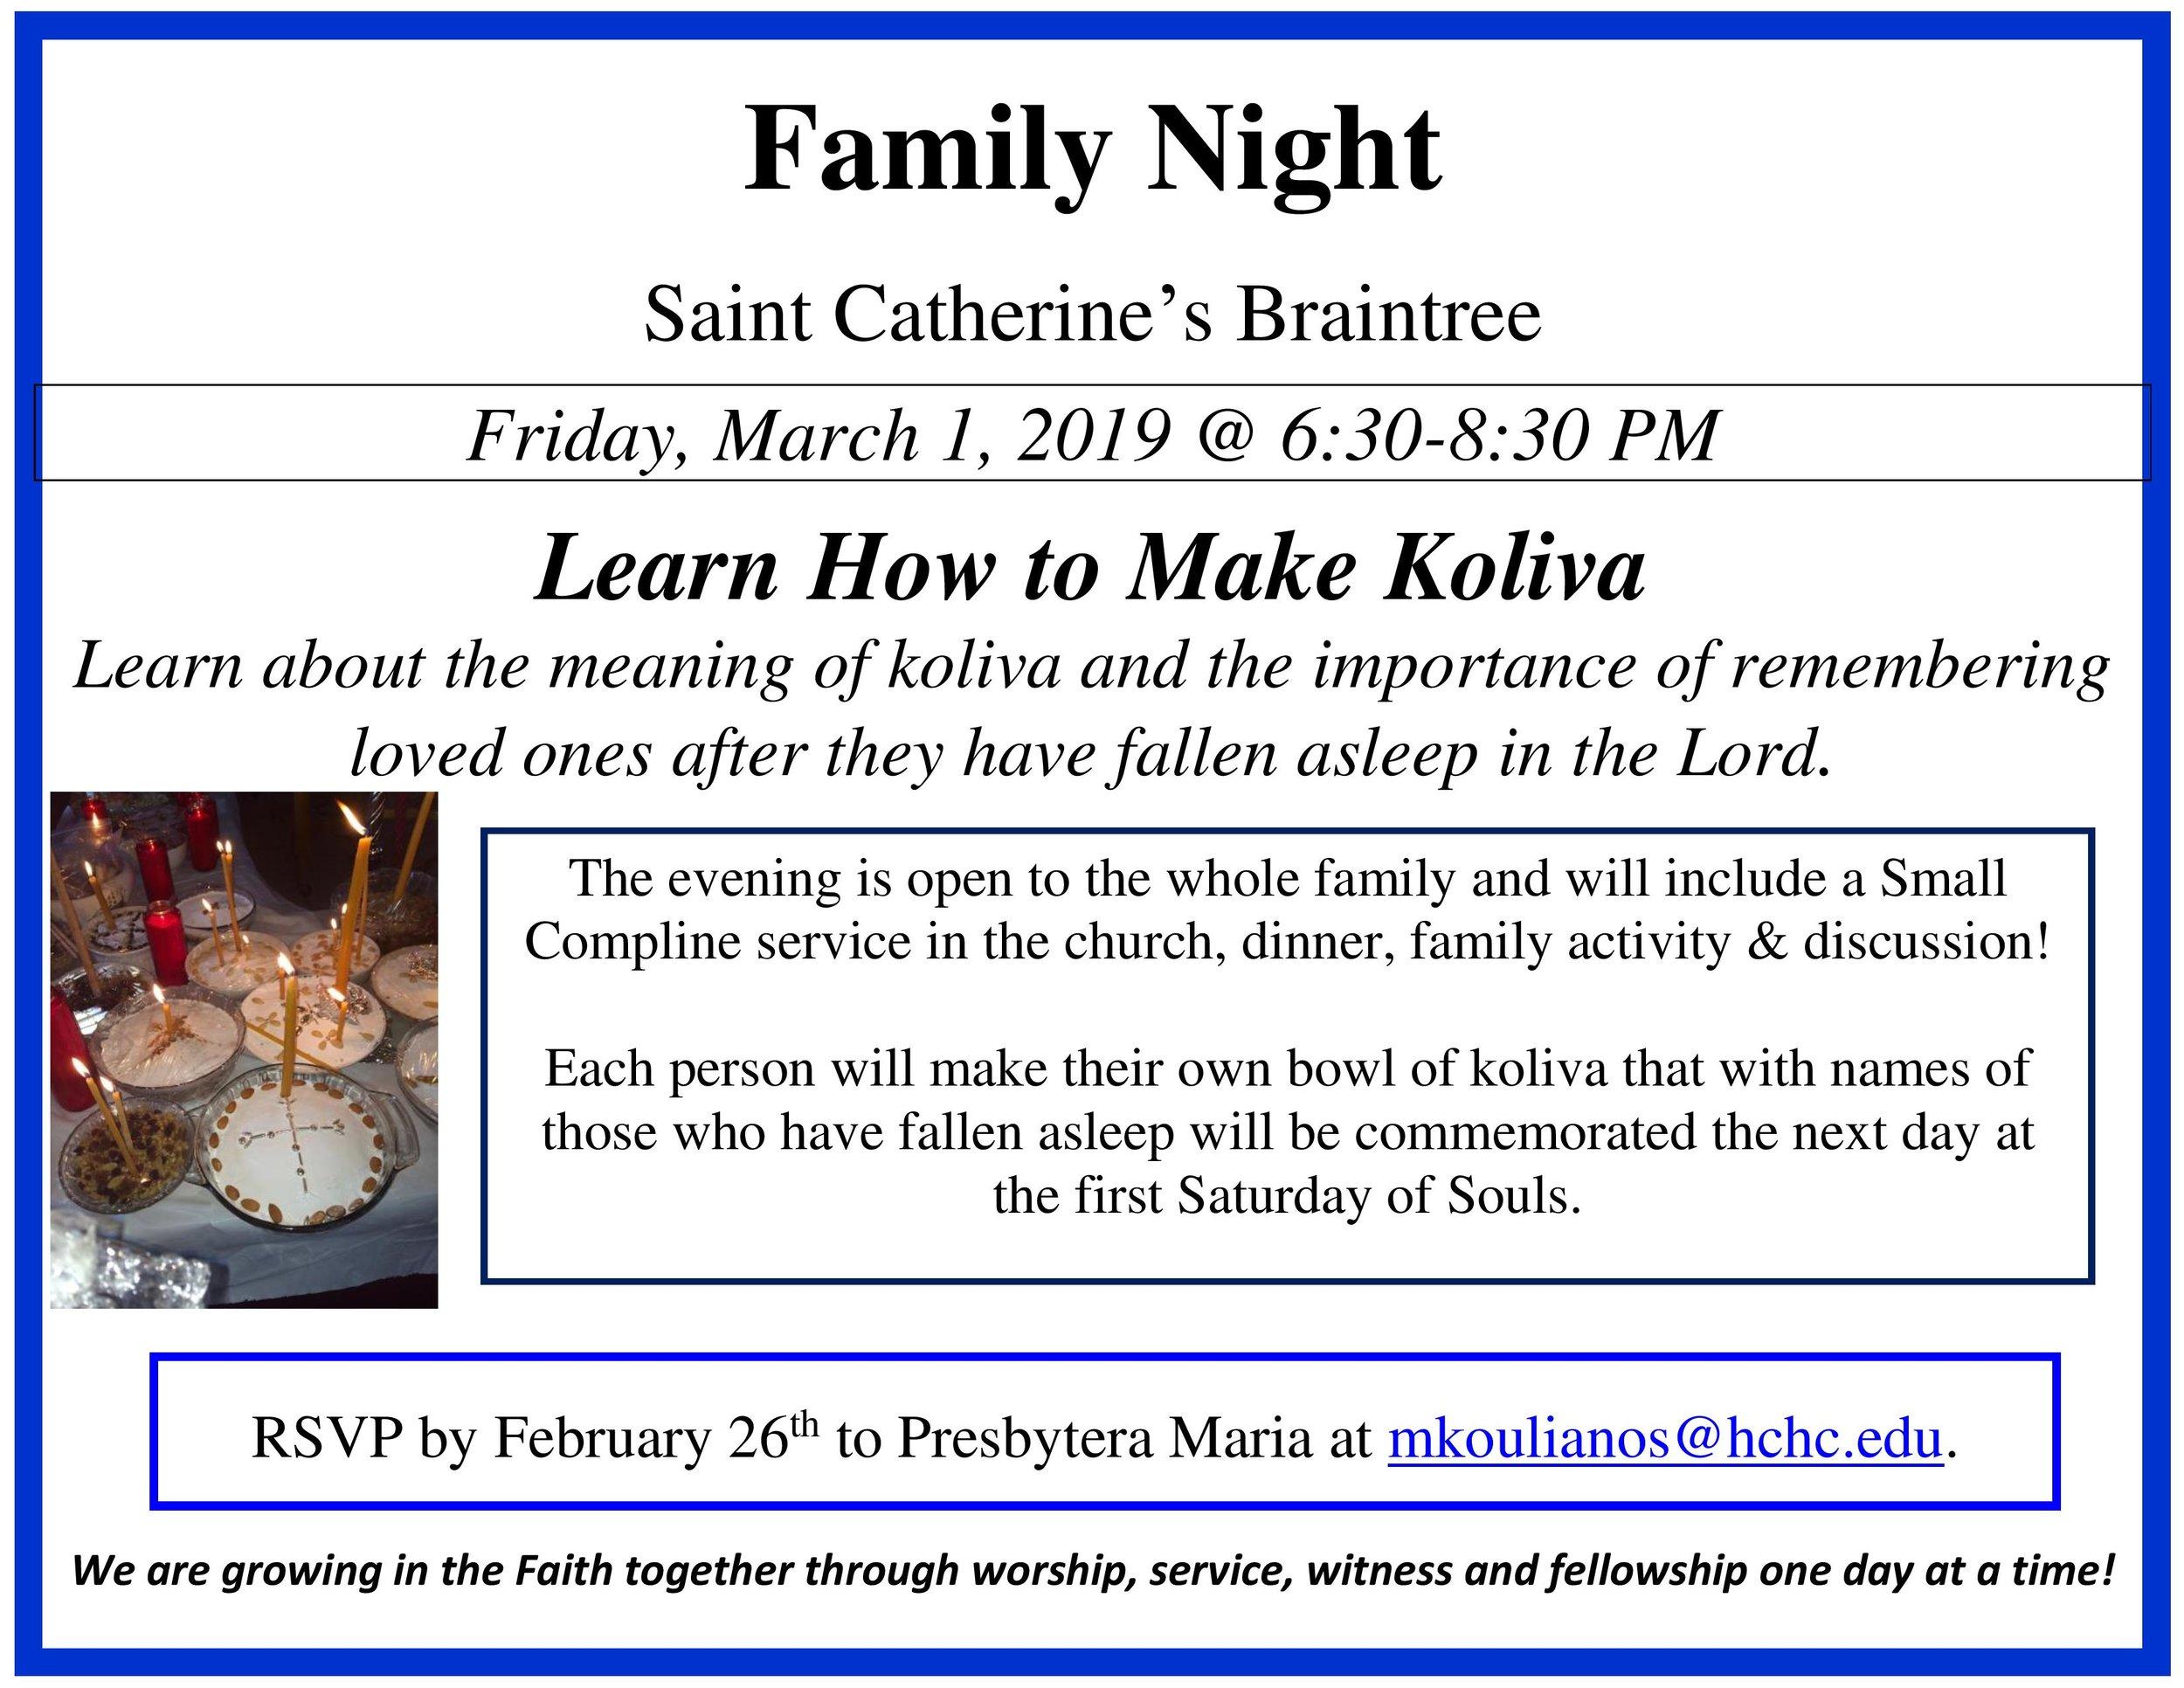 Family Night March 1 Kolliva-page-001.jpg